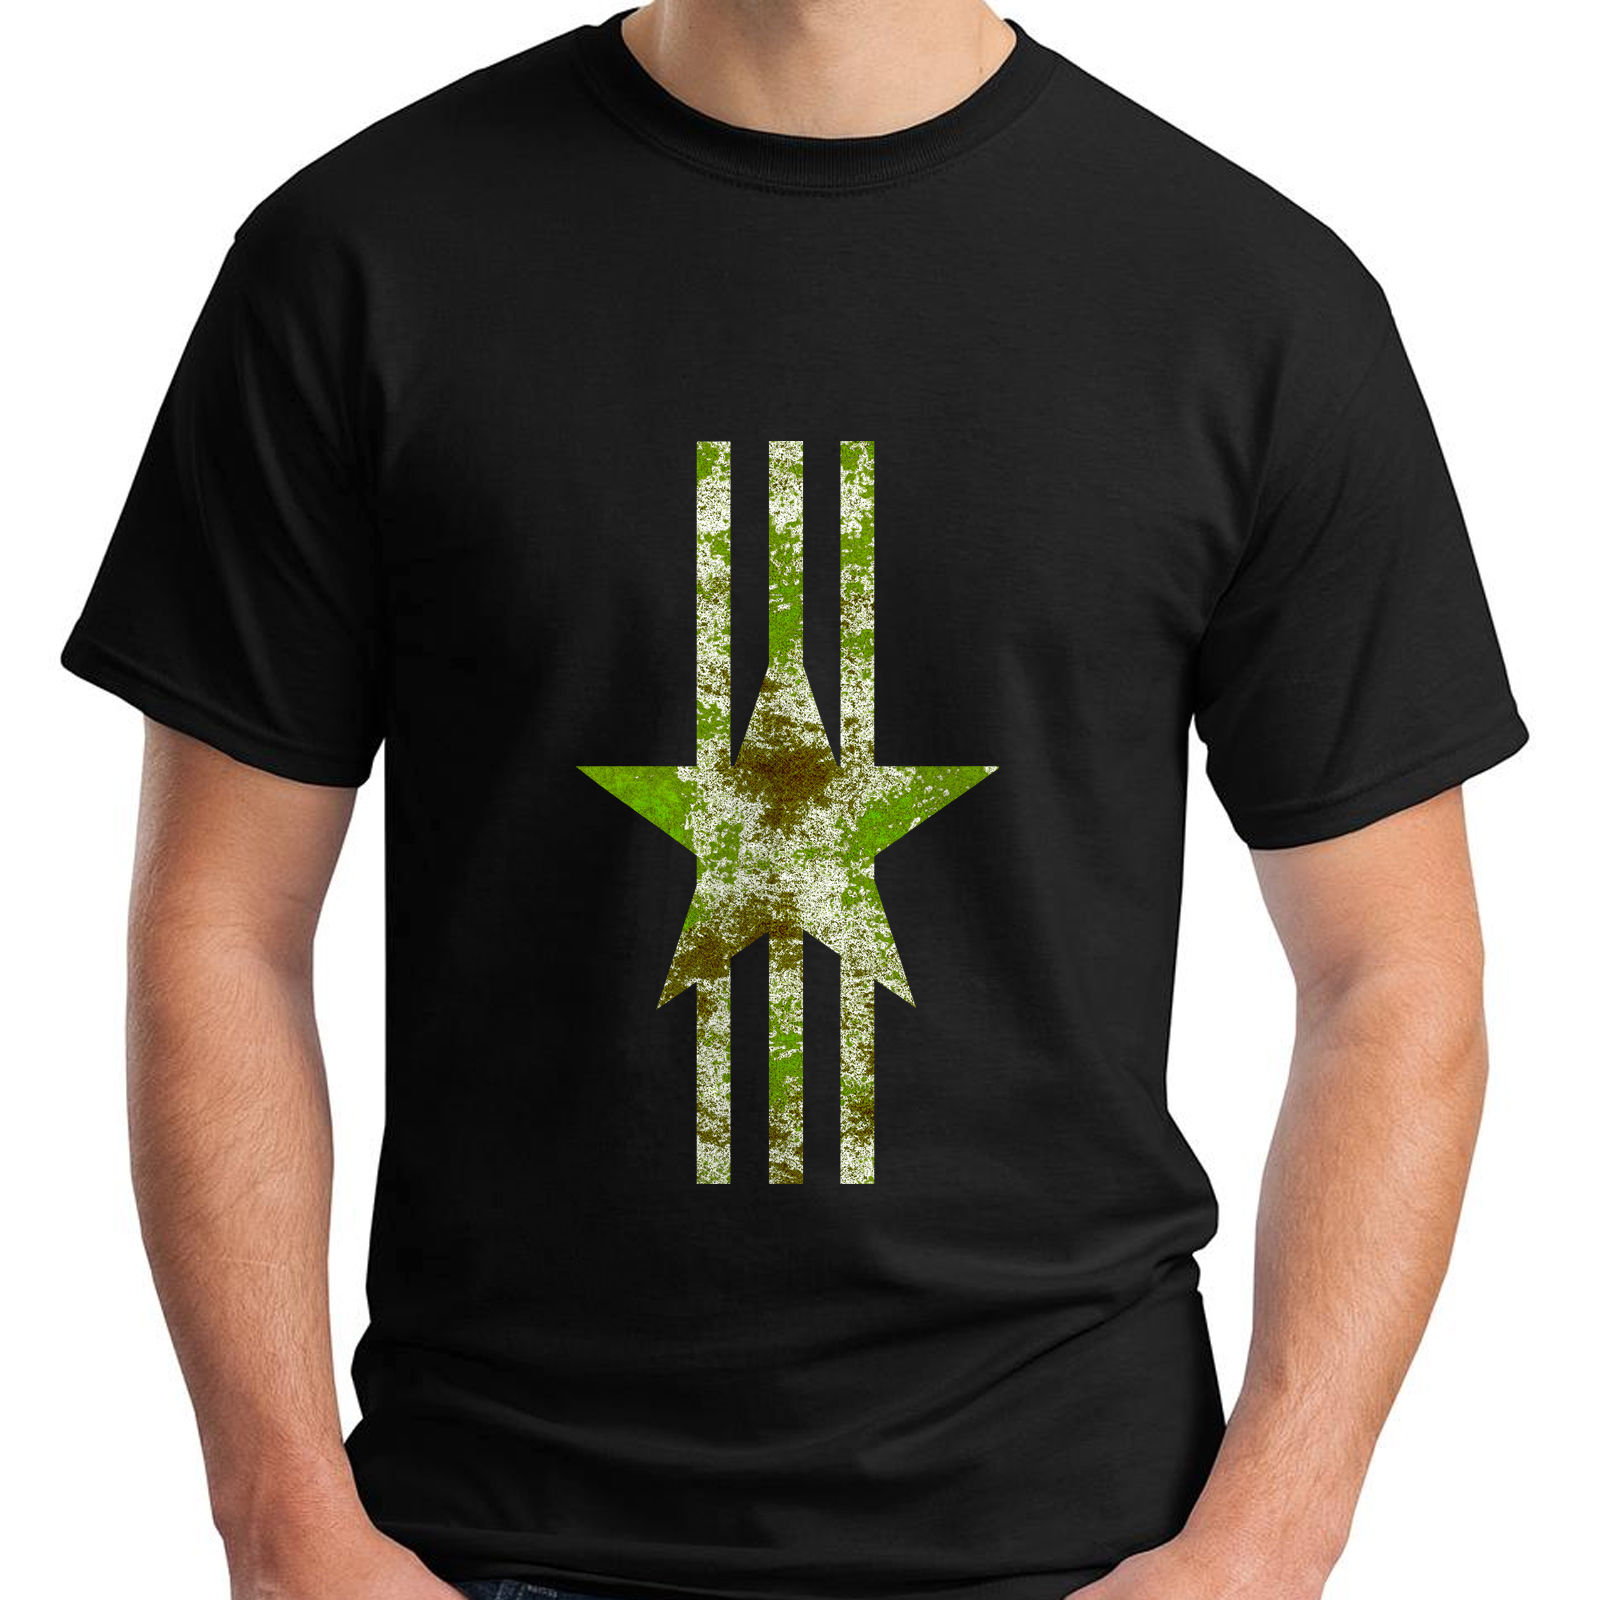 Black t shirt custom - Personalized T Shirt Custom T Shirt New Military Green Camo Star Logo White Stripes Conservative Men S Black T Shirt